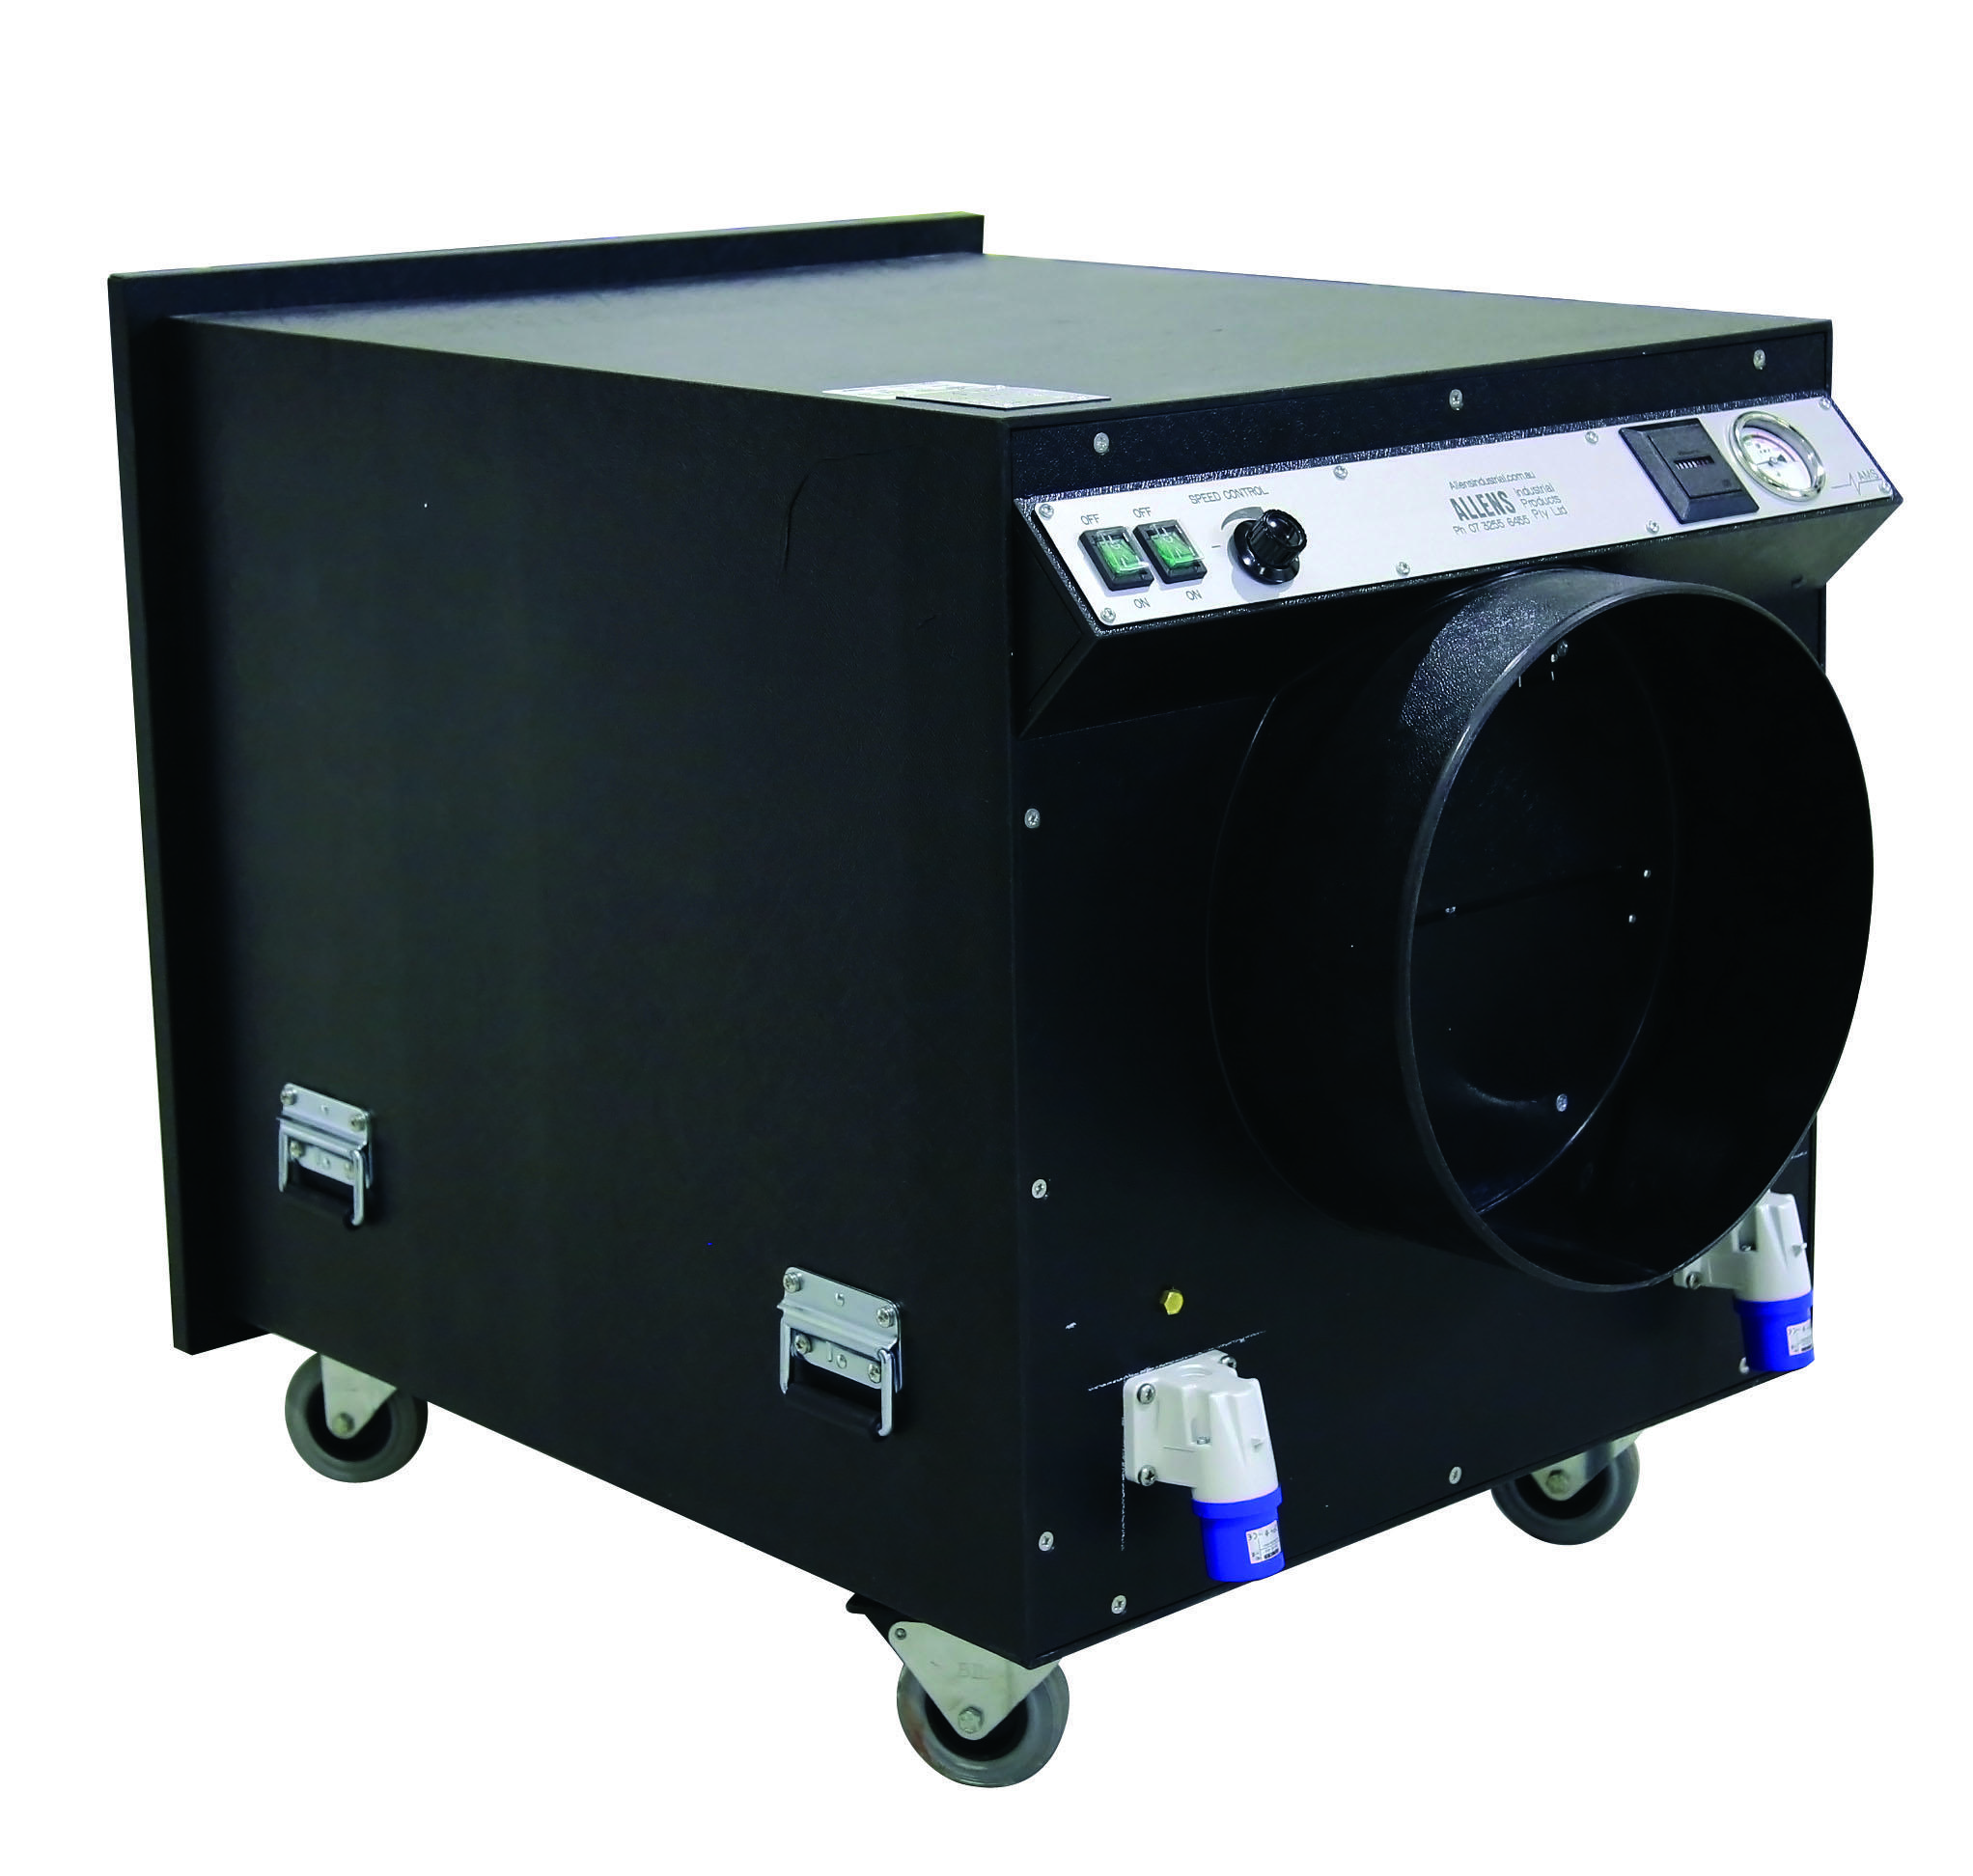 AMS4000 Negative Pressure Unit 4000